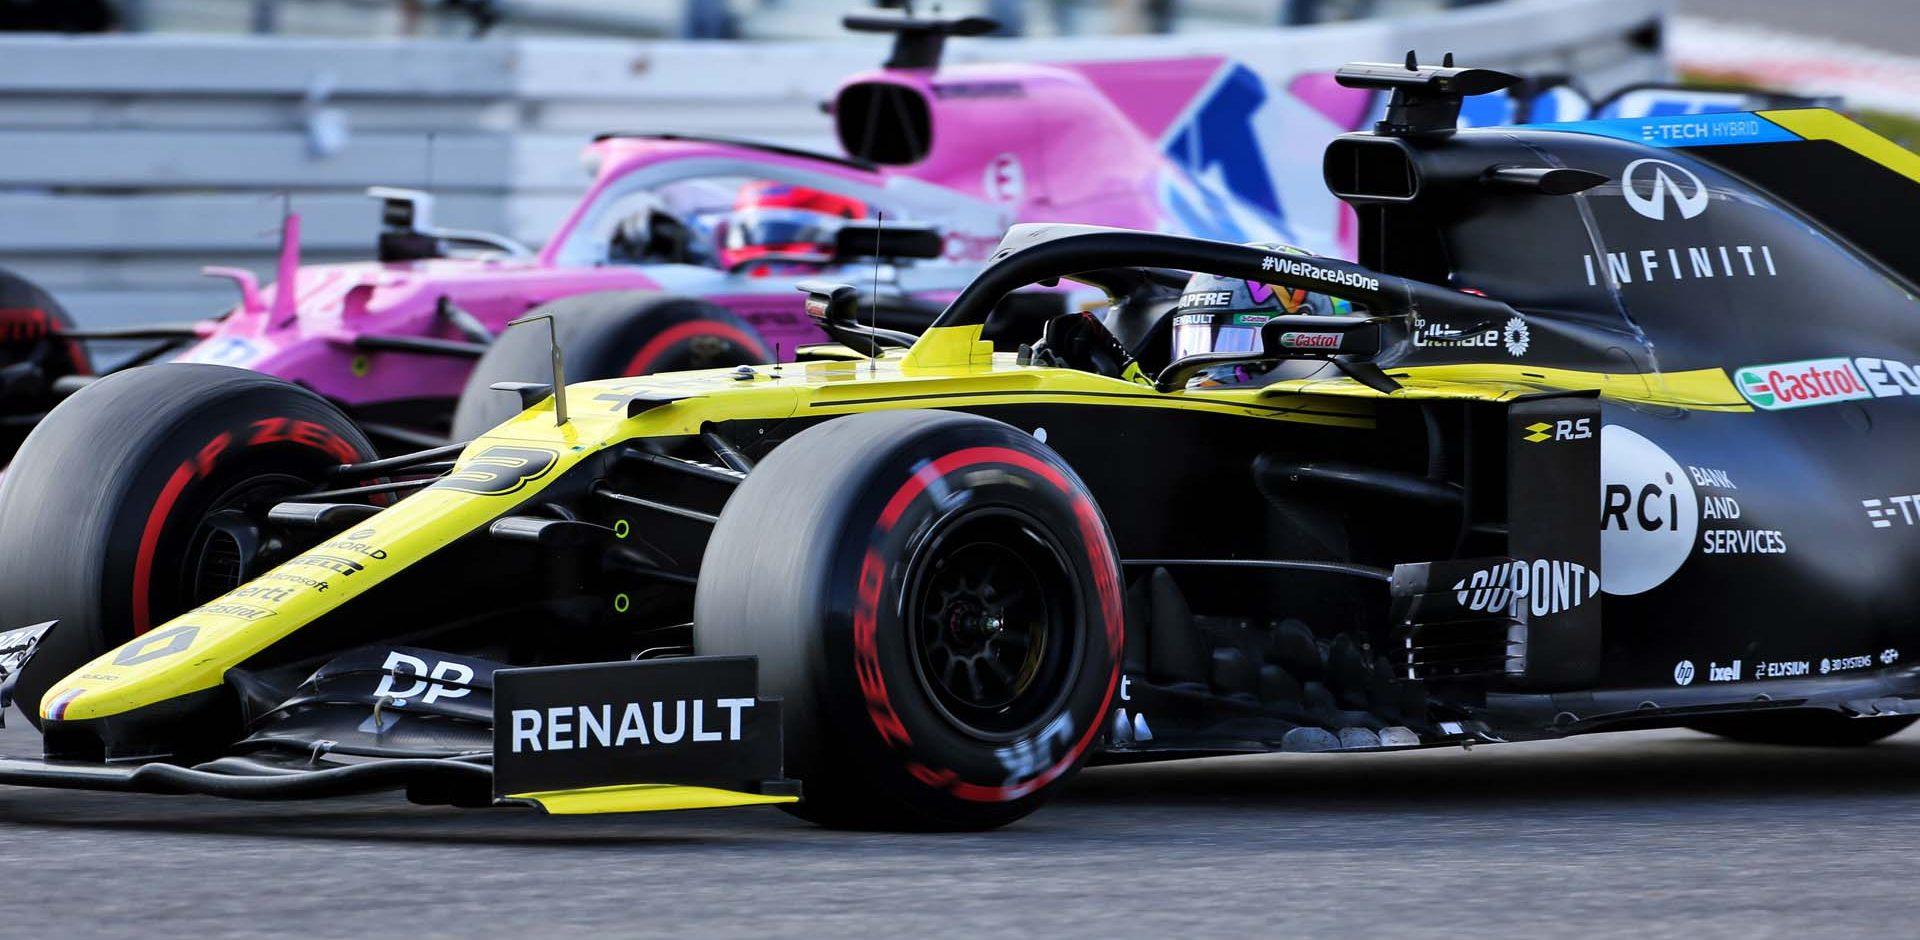 Daniel Ricciardo (AUS) Renault F1 Team RS20 and Sergio Perez (MEX) Racing Point F1 Team RP19 battle for position. Eifel Grand Prix, Sunday 11th October 2020. Nurbugring, Germany.